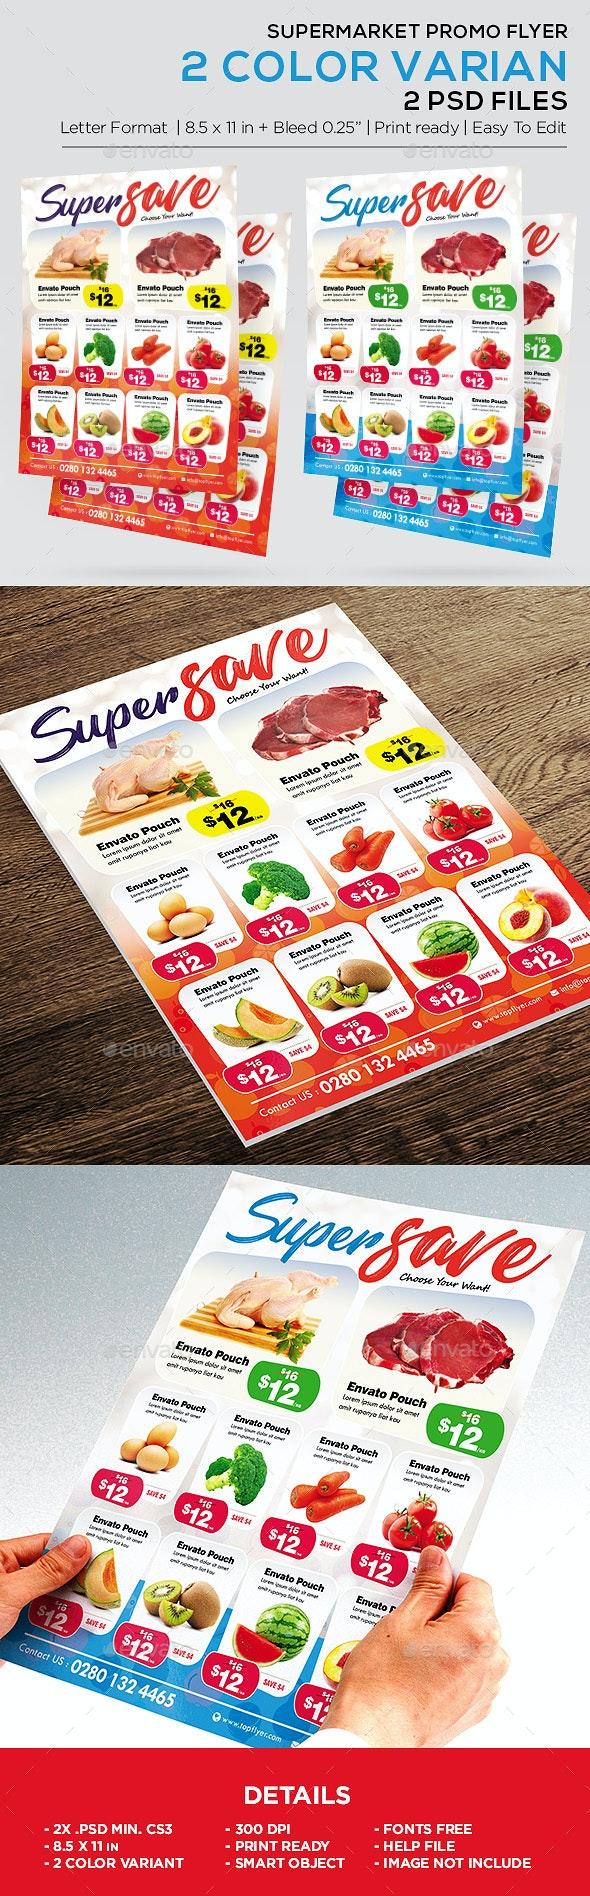 Supermarket Promotion Flyer - Product Catalog Flyer - Commerce Flyers